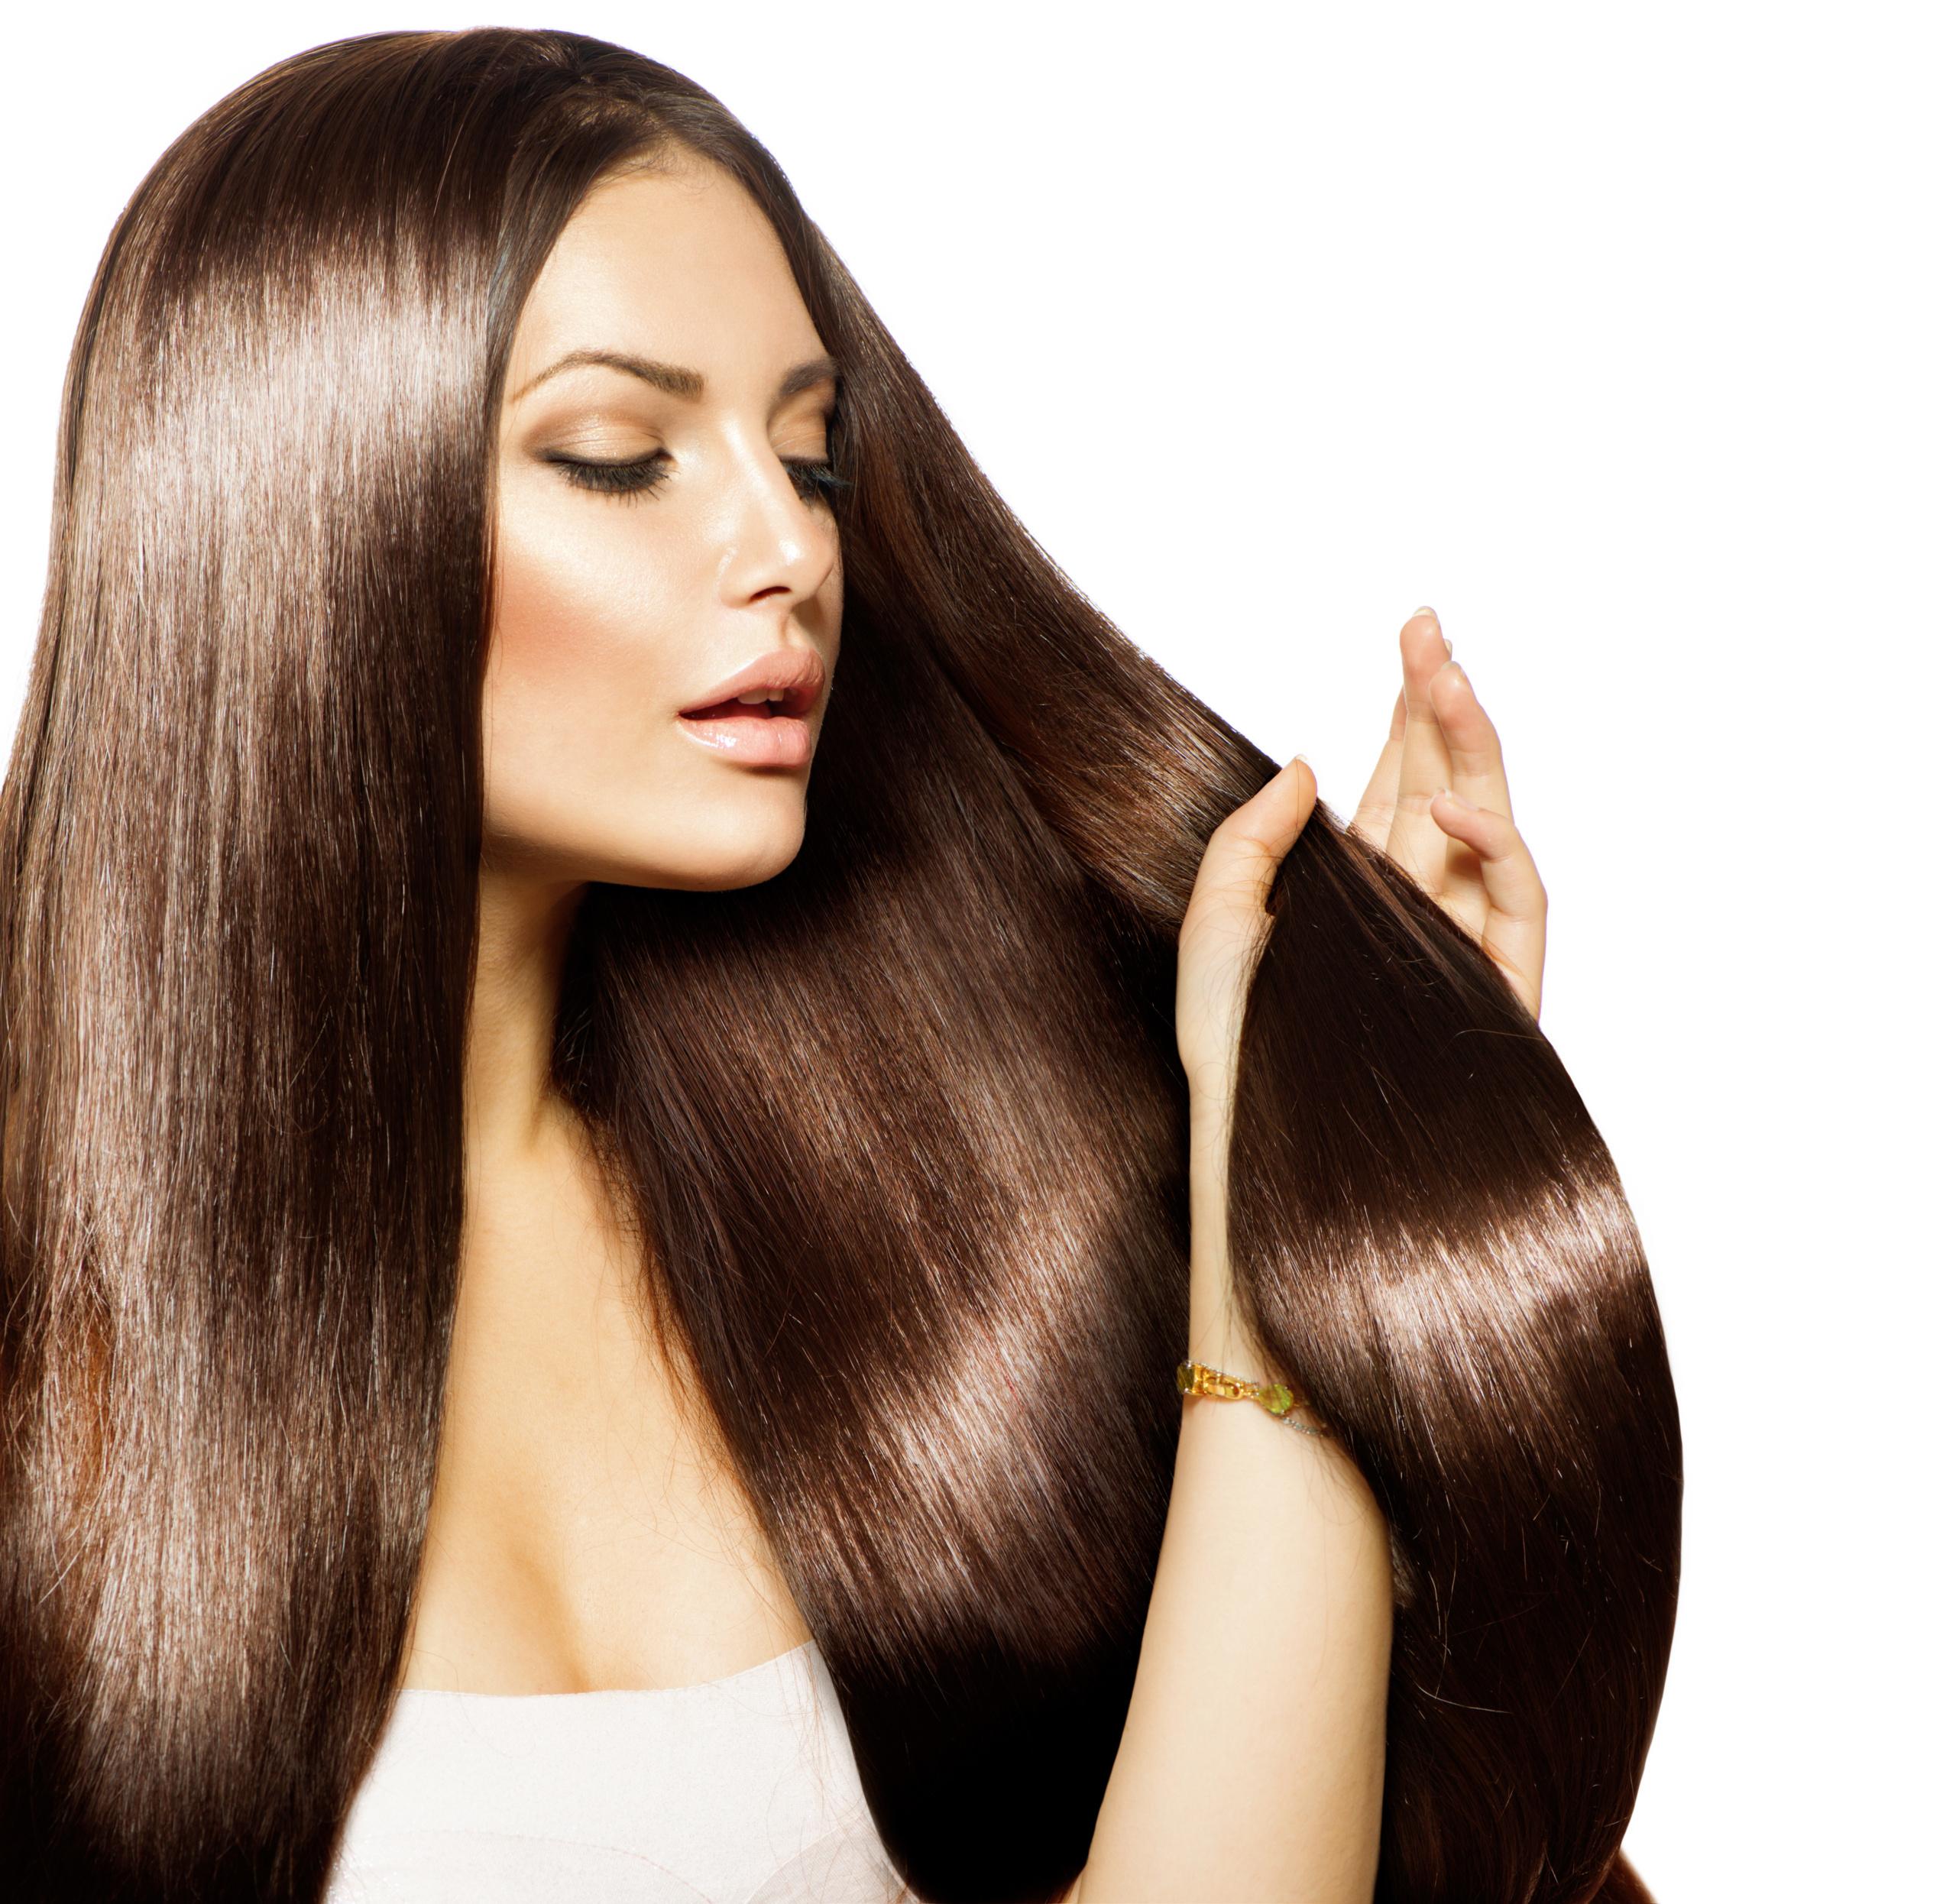 Korean Hair Care Routine Made Easy: 10 Secrets Of Healthy Long Hair